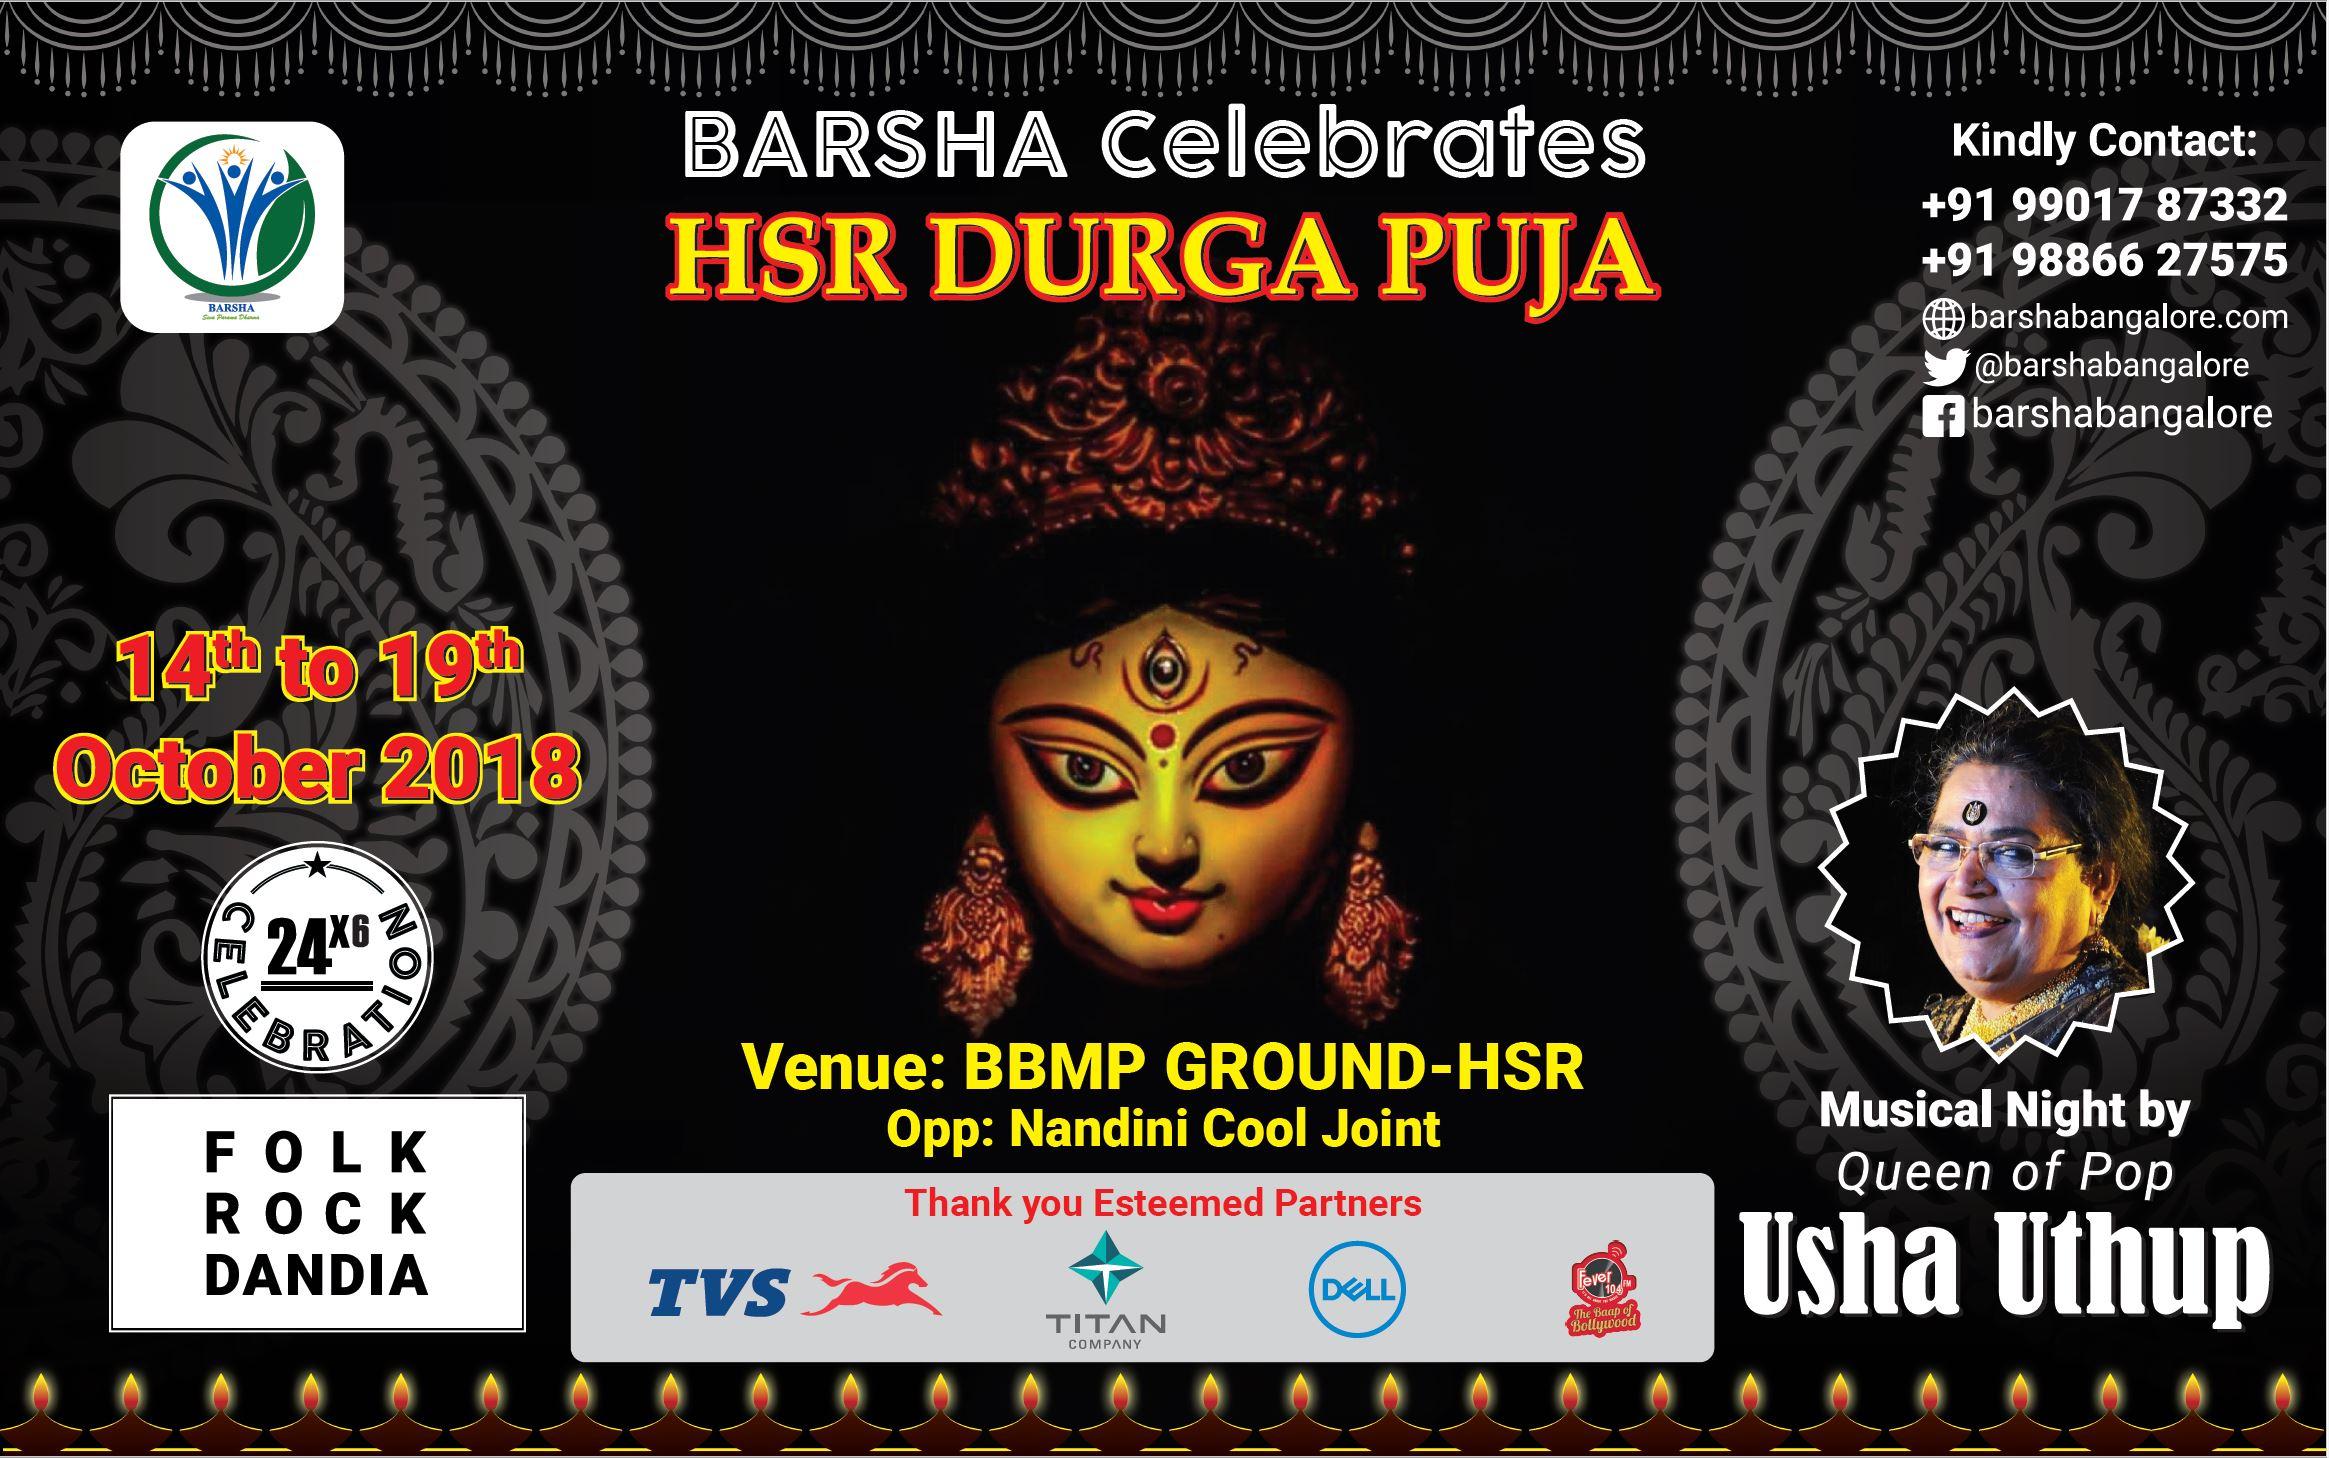 Barsha Bengali Association in HSR Layout organises the biggest Durga Puja in Bangalore